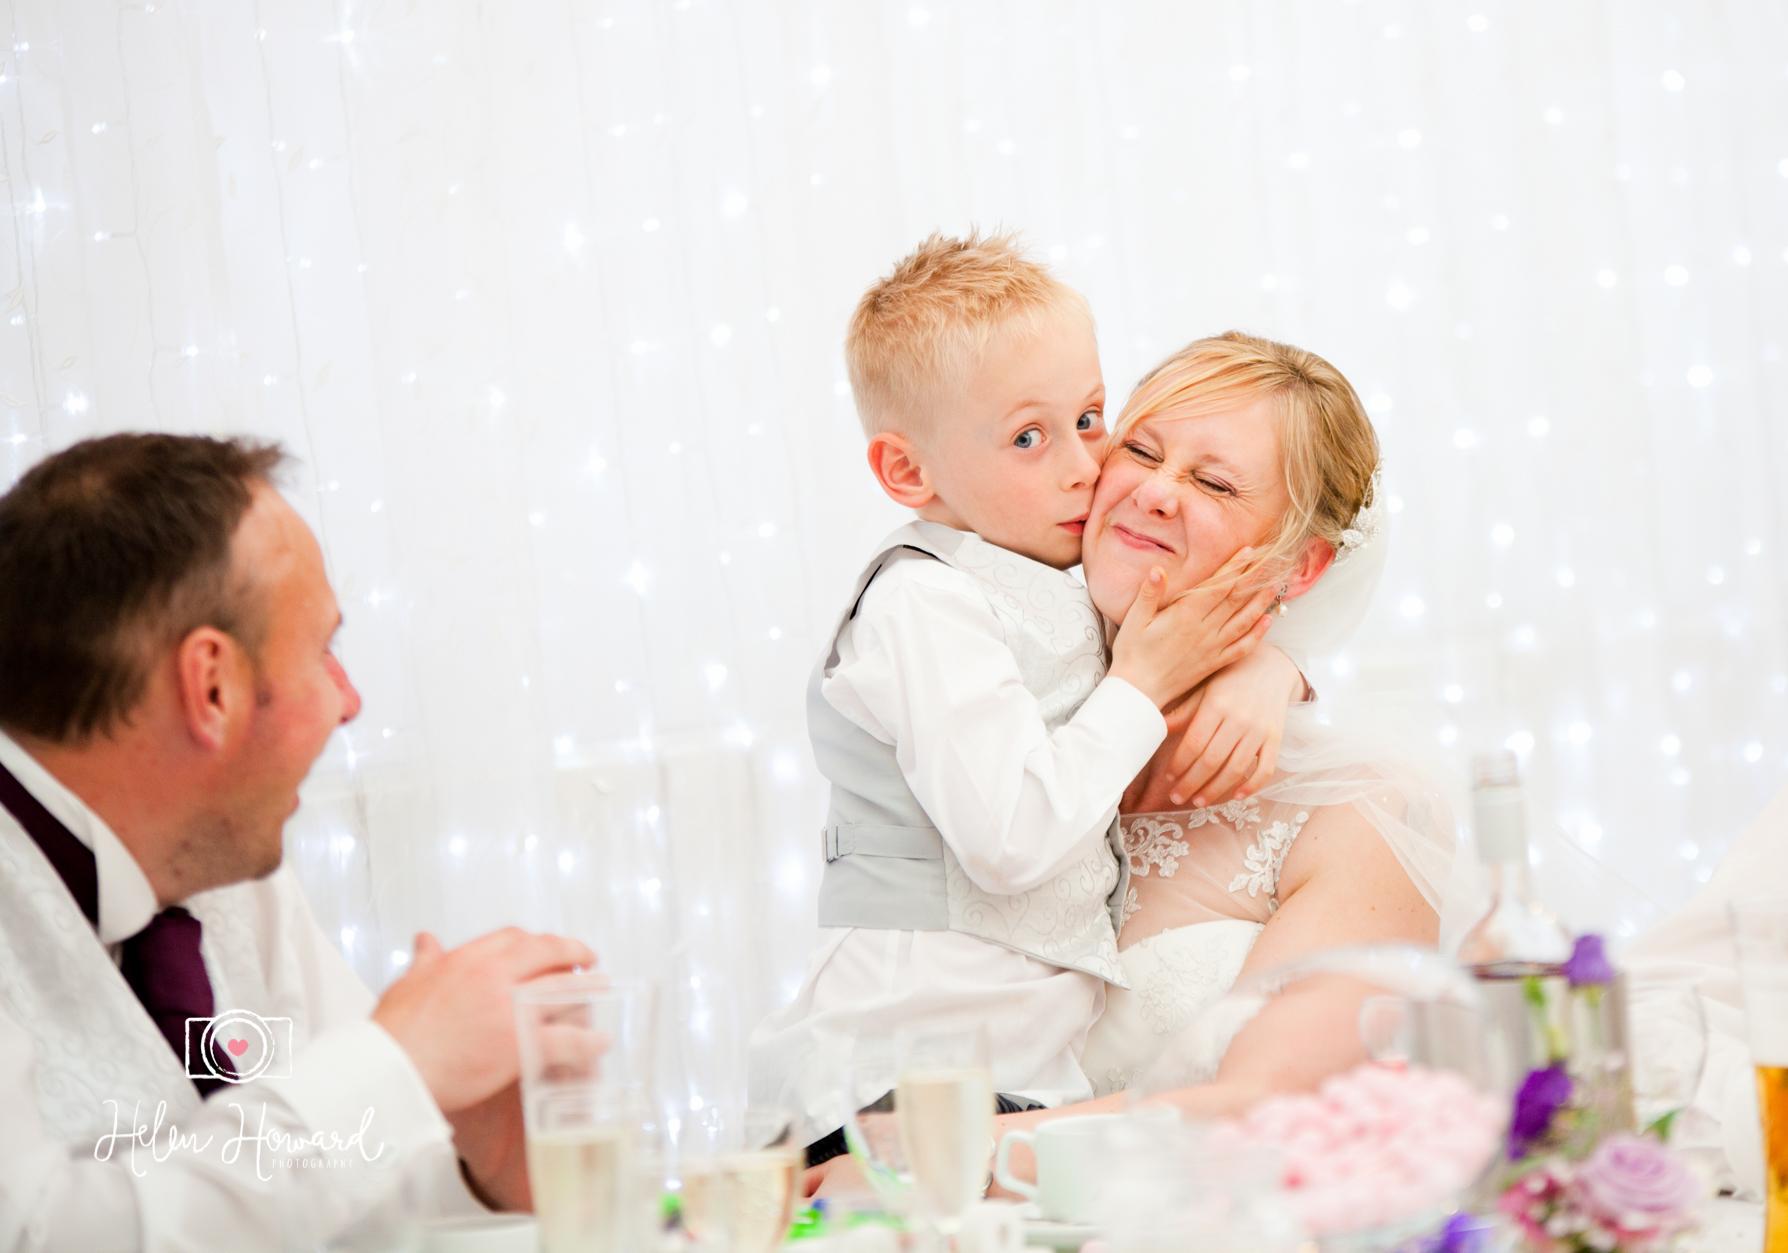 Hawkesyard Estate weddings in Rugeley bride and her son